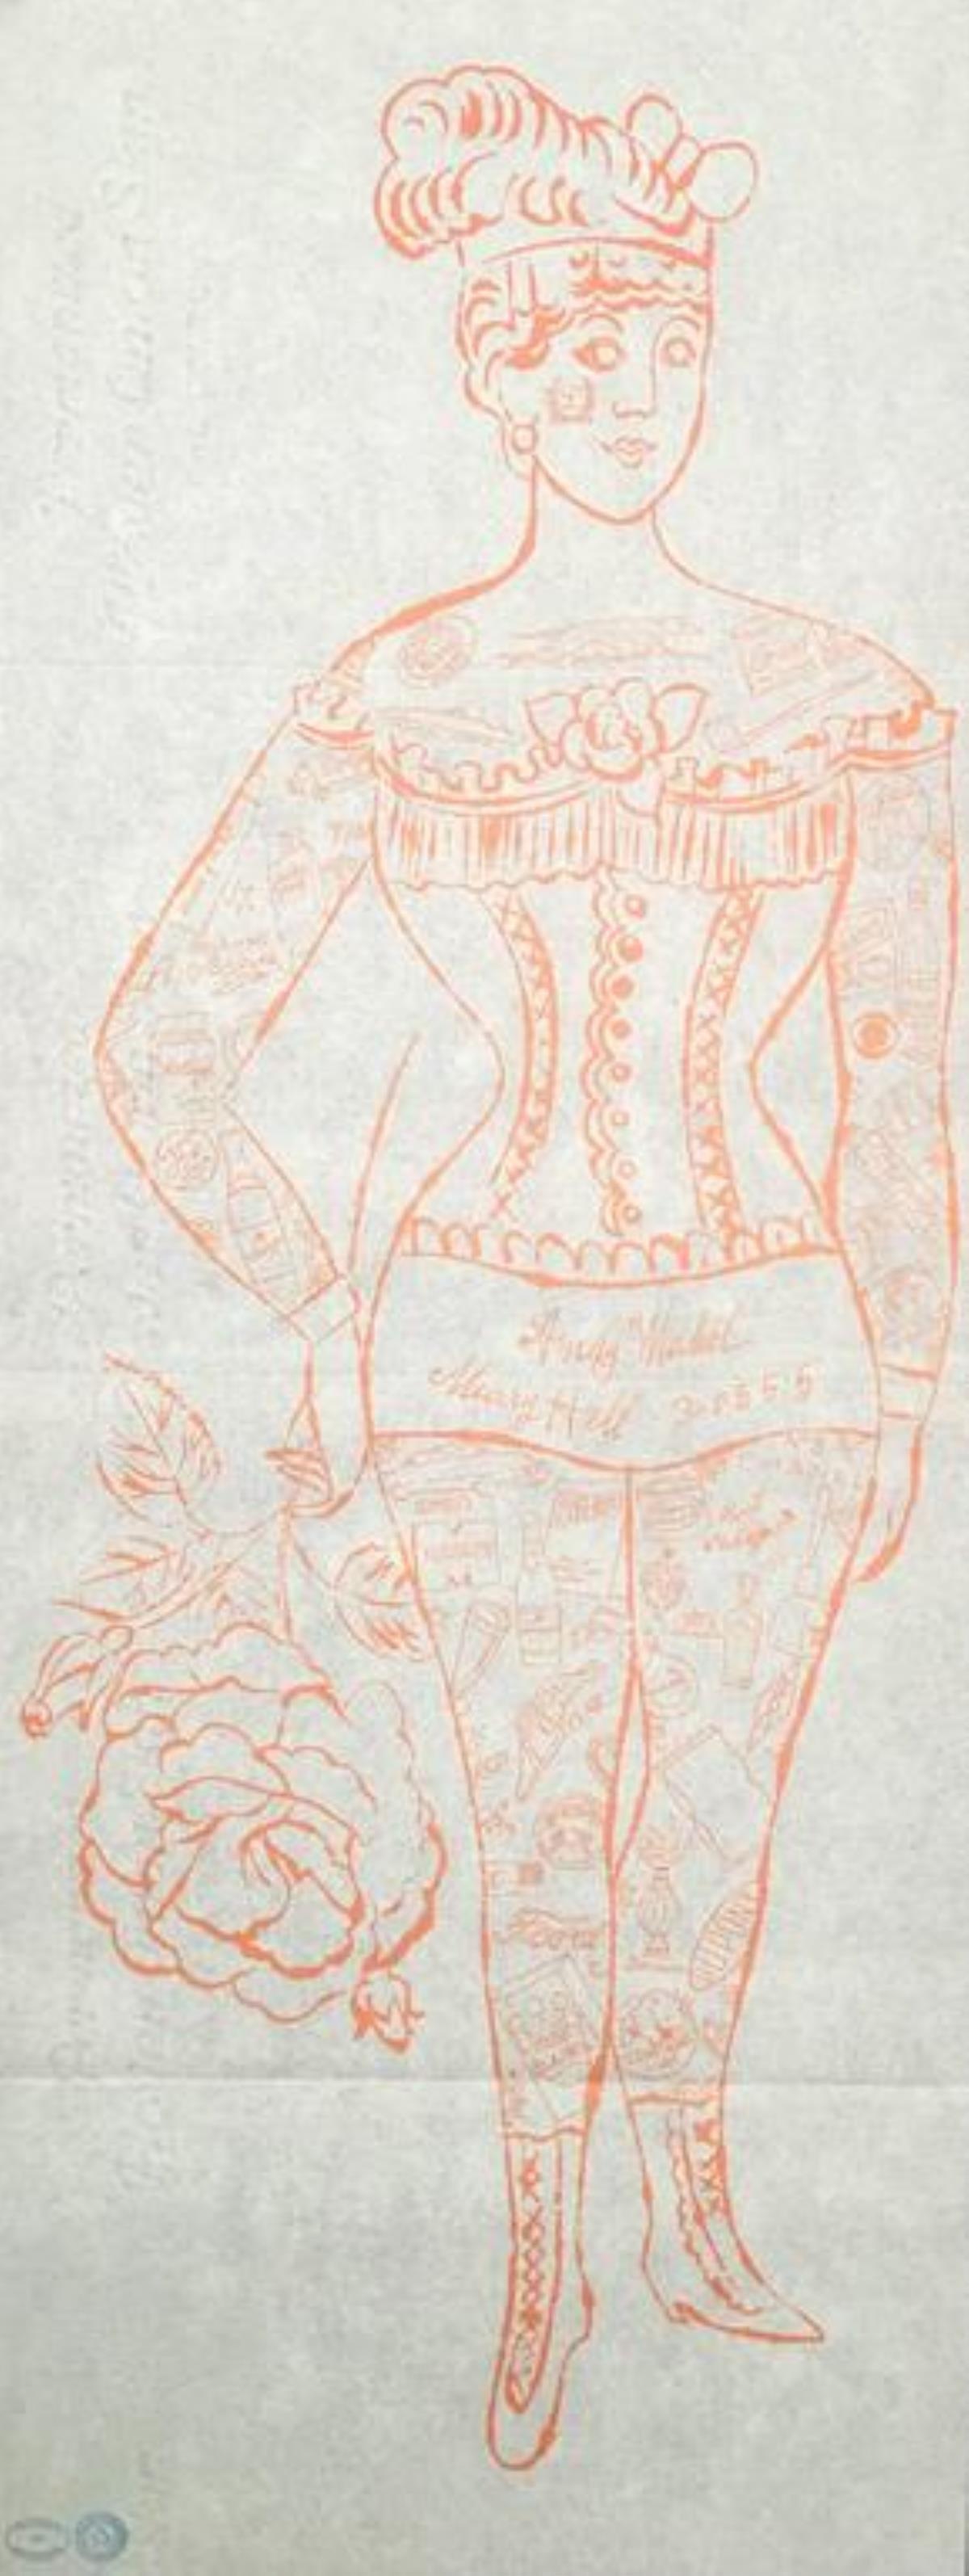 Andy Warhol - Tattooed Woman